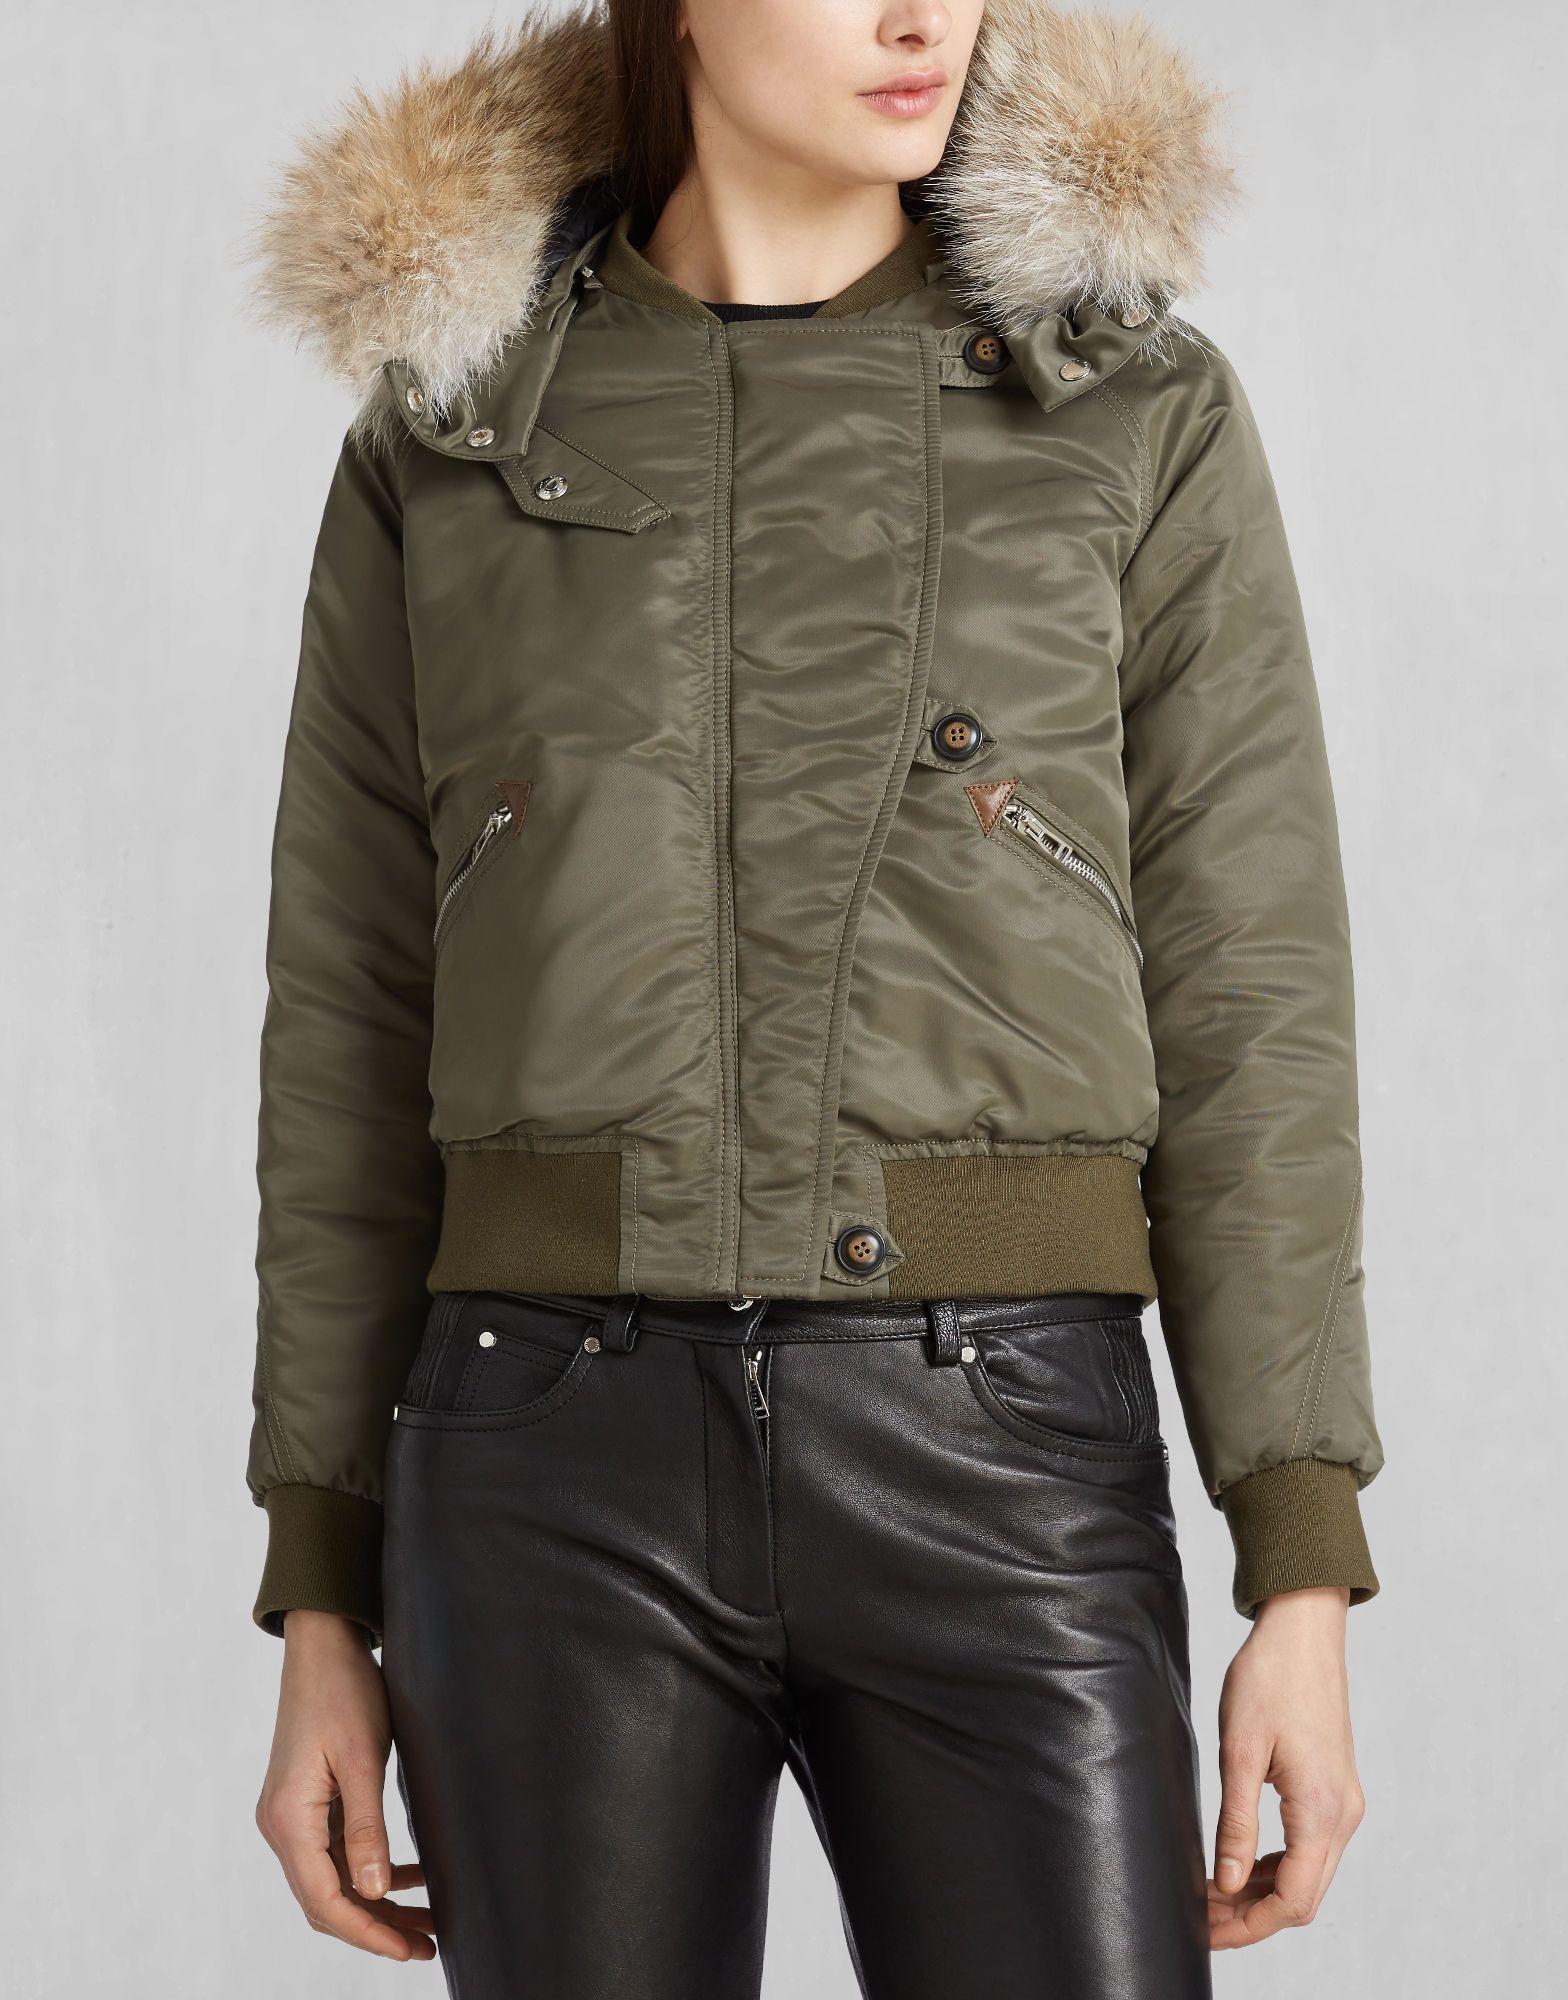 Bovet Jacket Women S Jackets Coats Belstaff Coats Jackets Women Lightweight Bomber Jacket Jackets For Women [ 2000 x 1568 Pixel ]